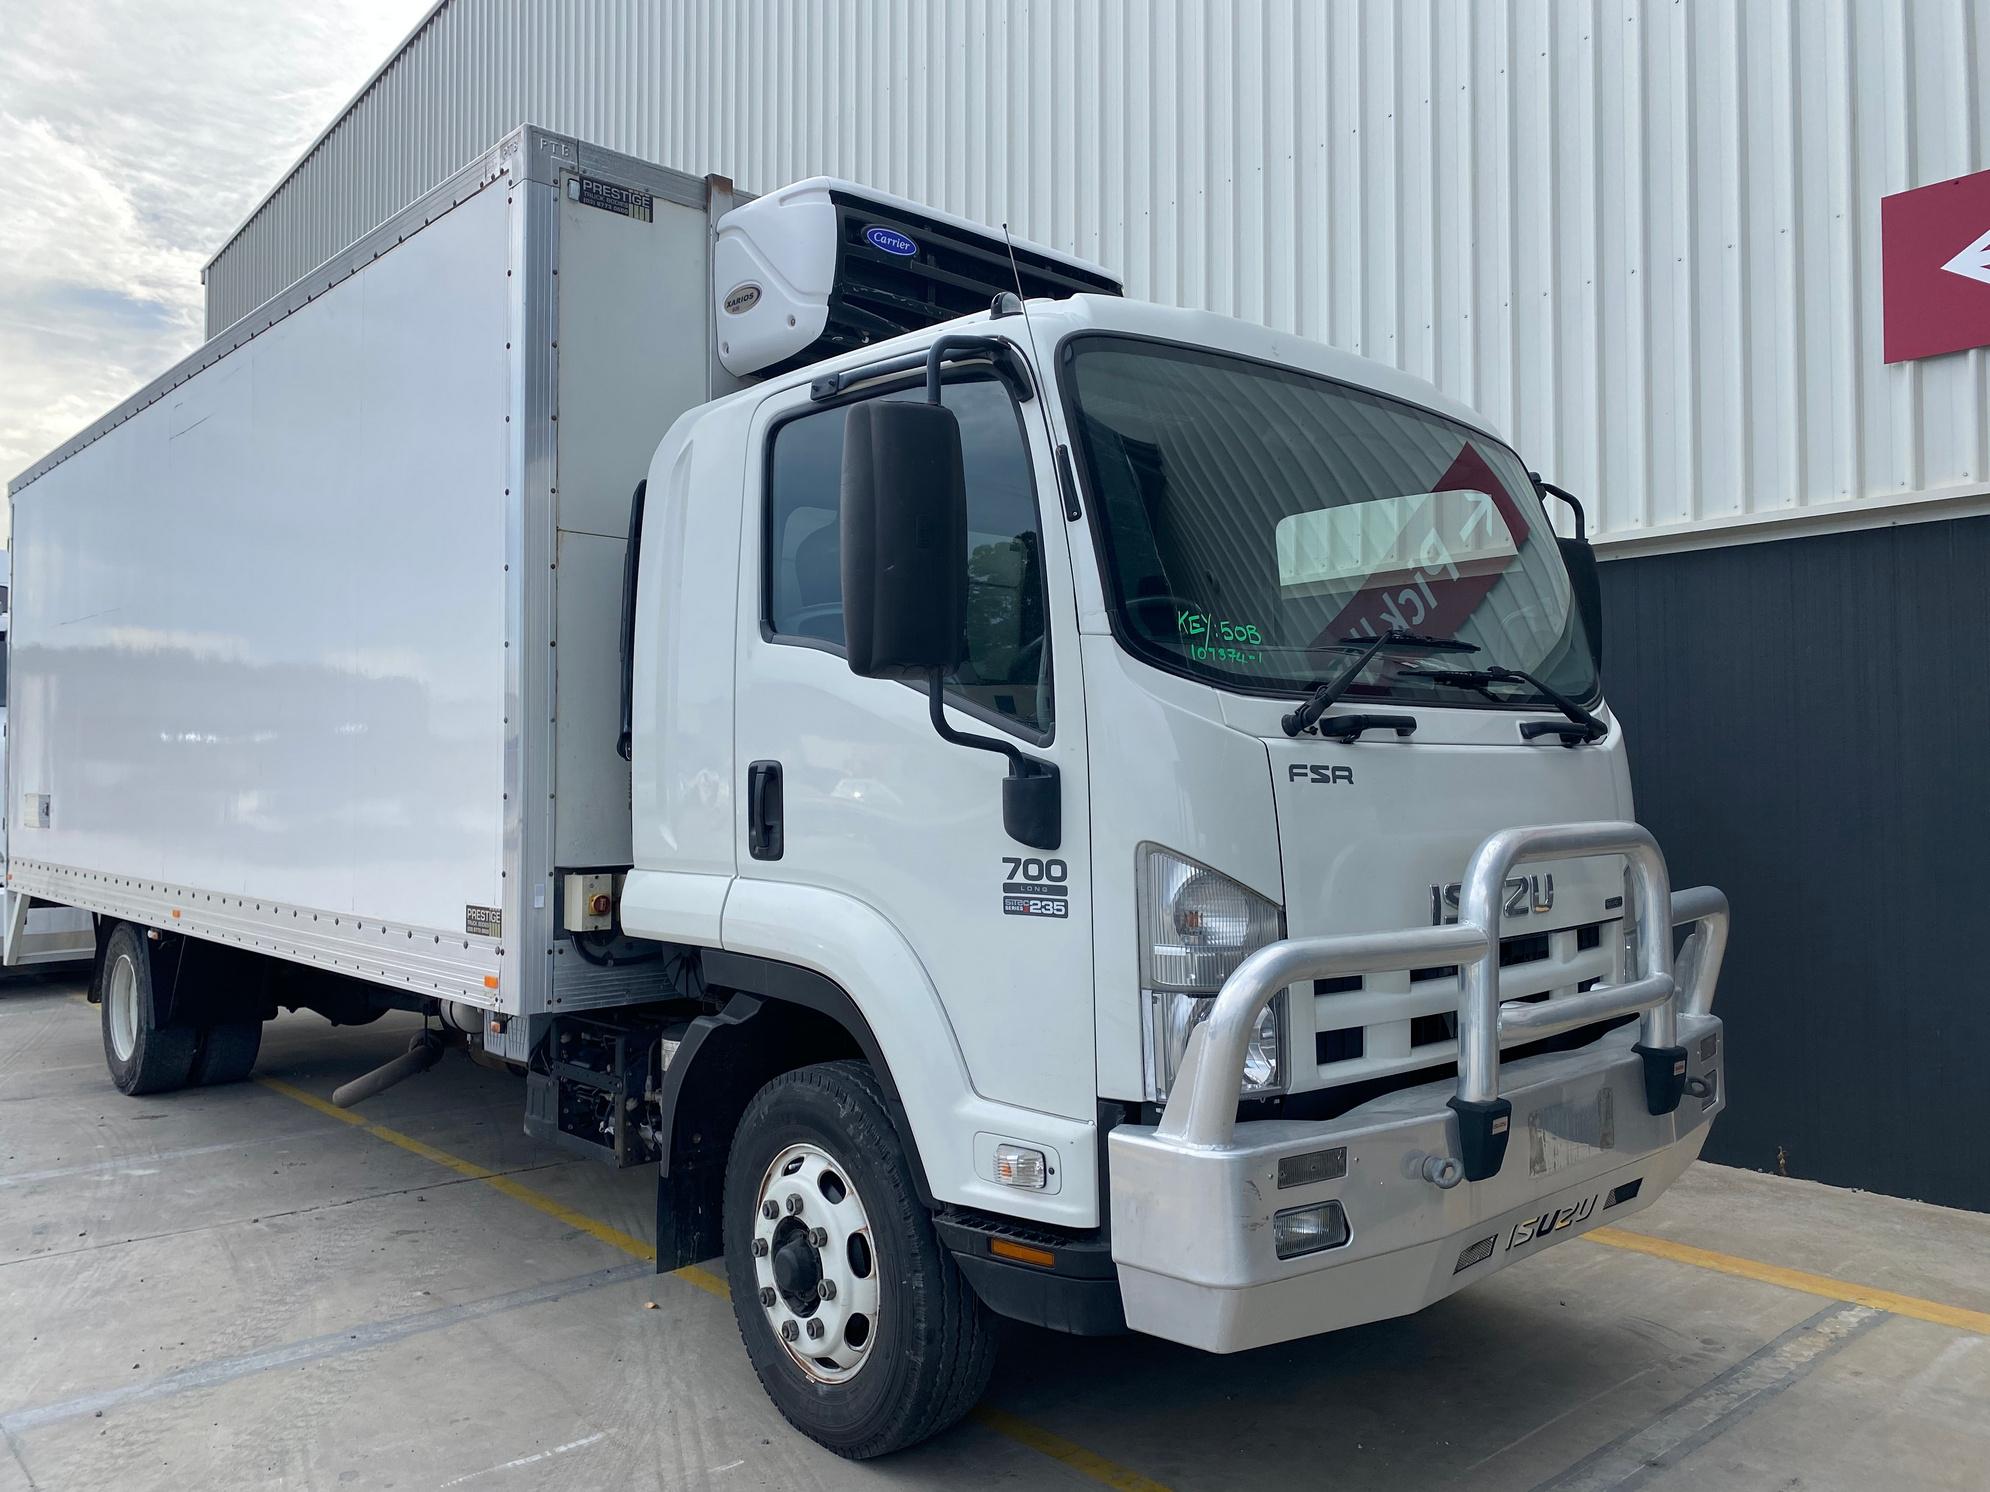 2008 Isuzu FSR700 Long 4 x 2 Refrigerated Body Truck